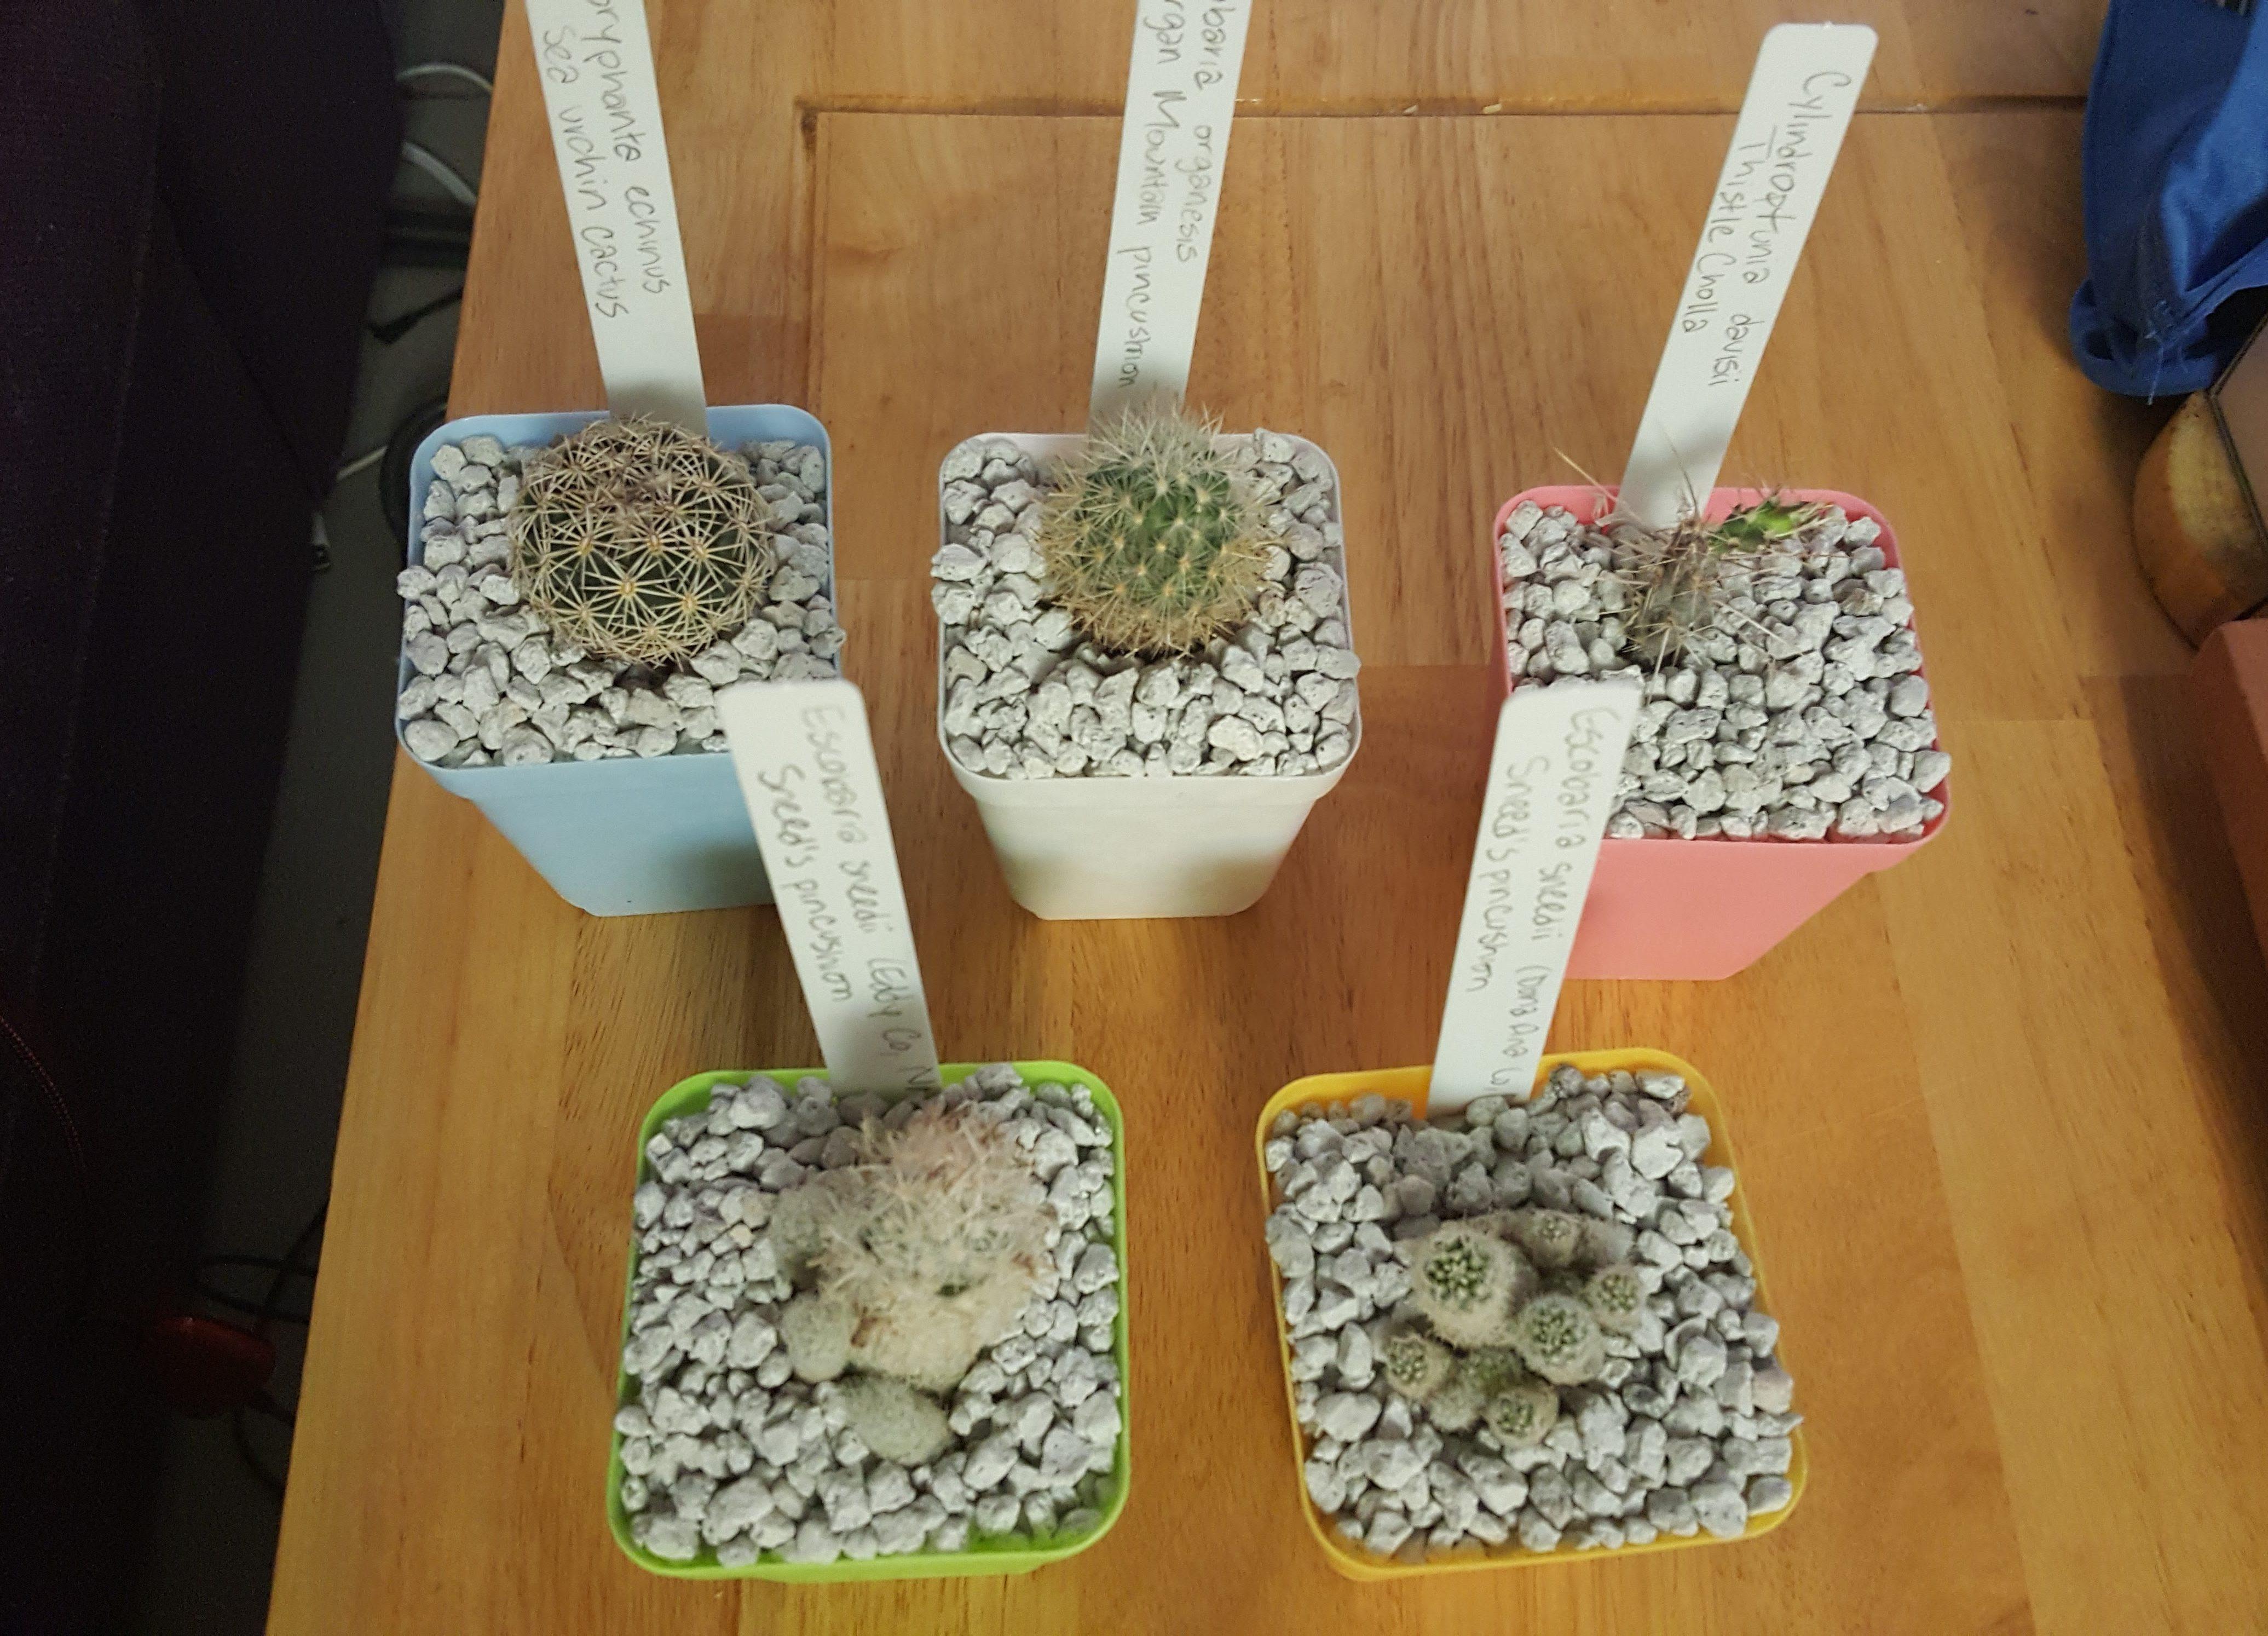 Summer 2017 cactus garden additions.